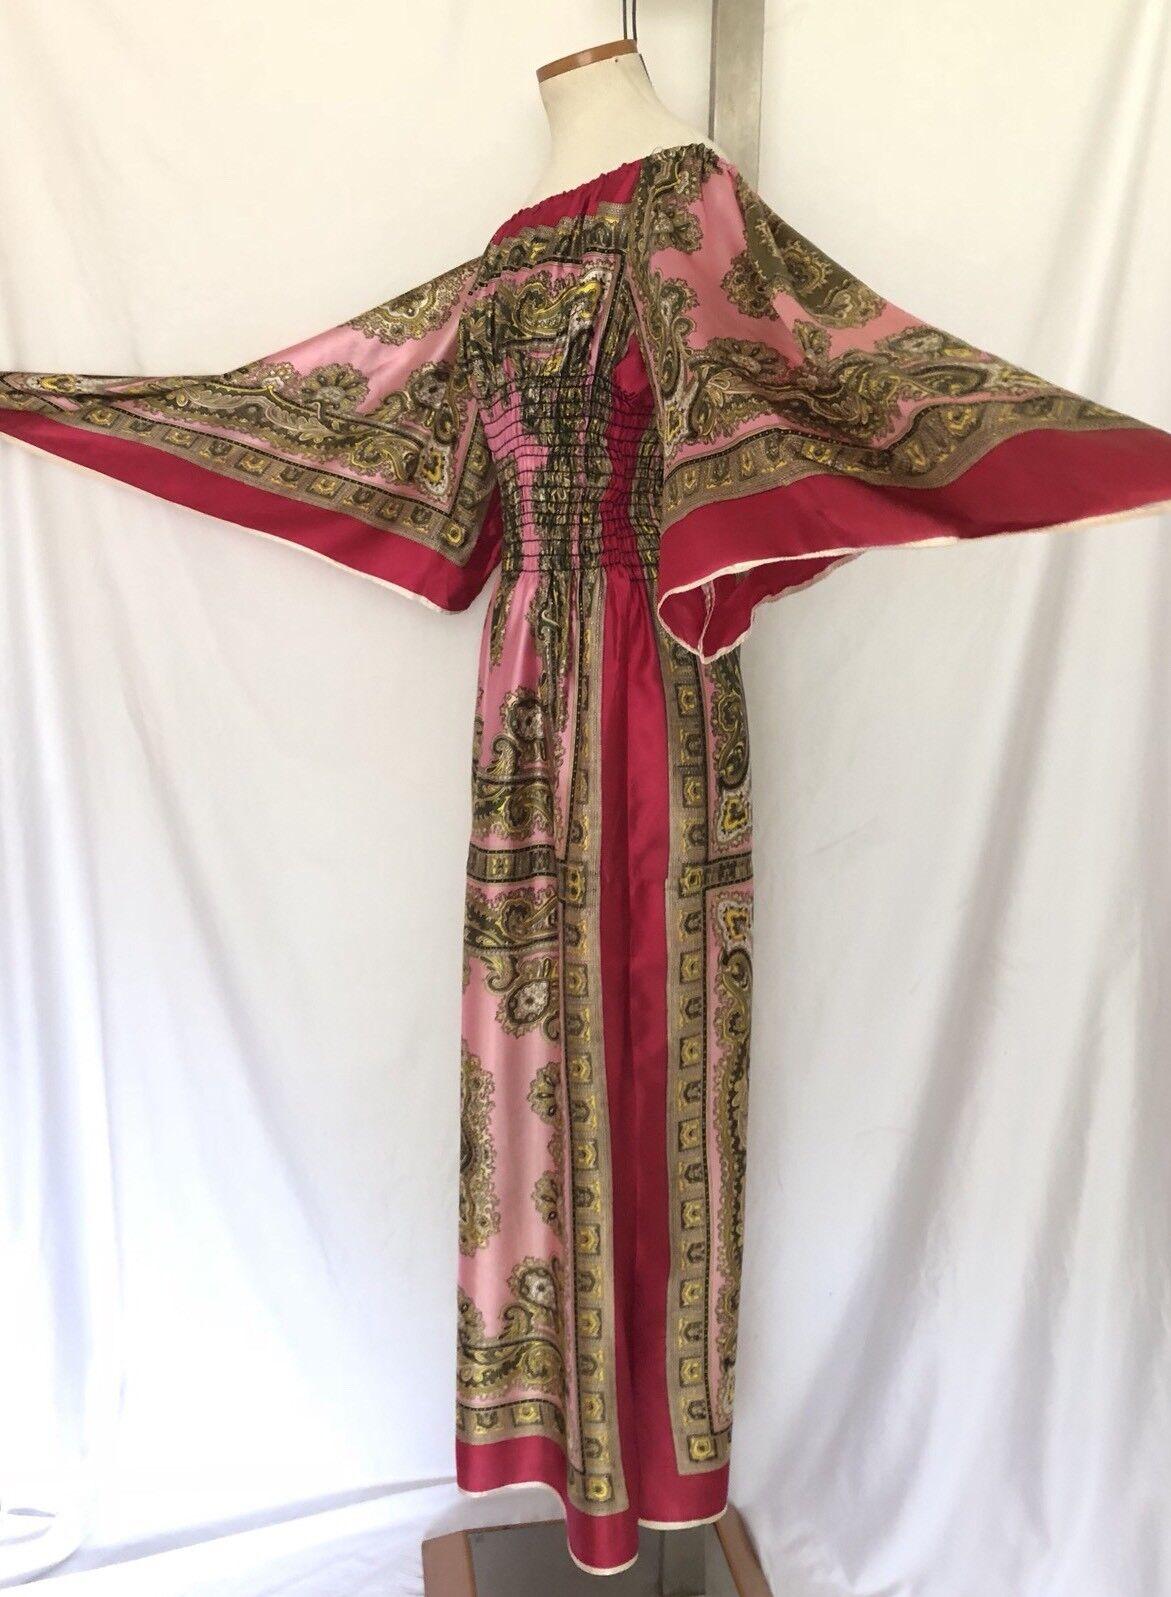 VIntage Paisley Print Dress BOHO Caftan Maxi Hand Rolled Hem Hand Made